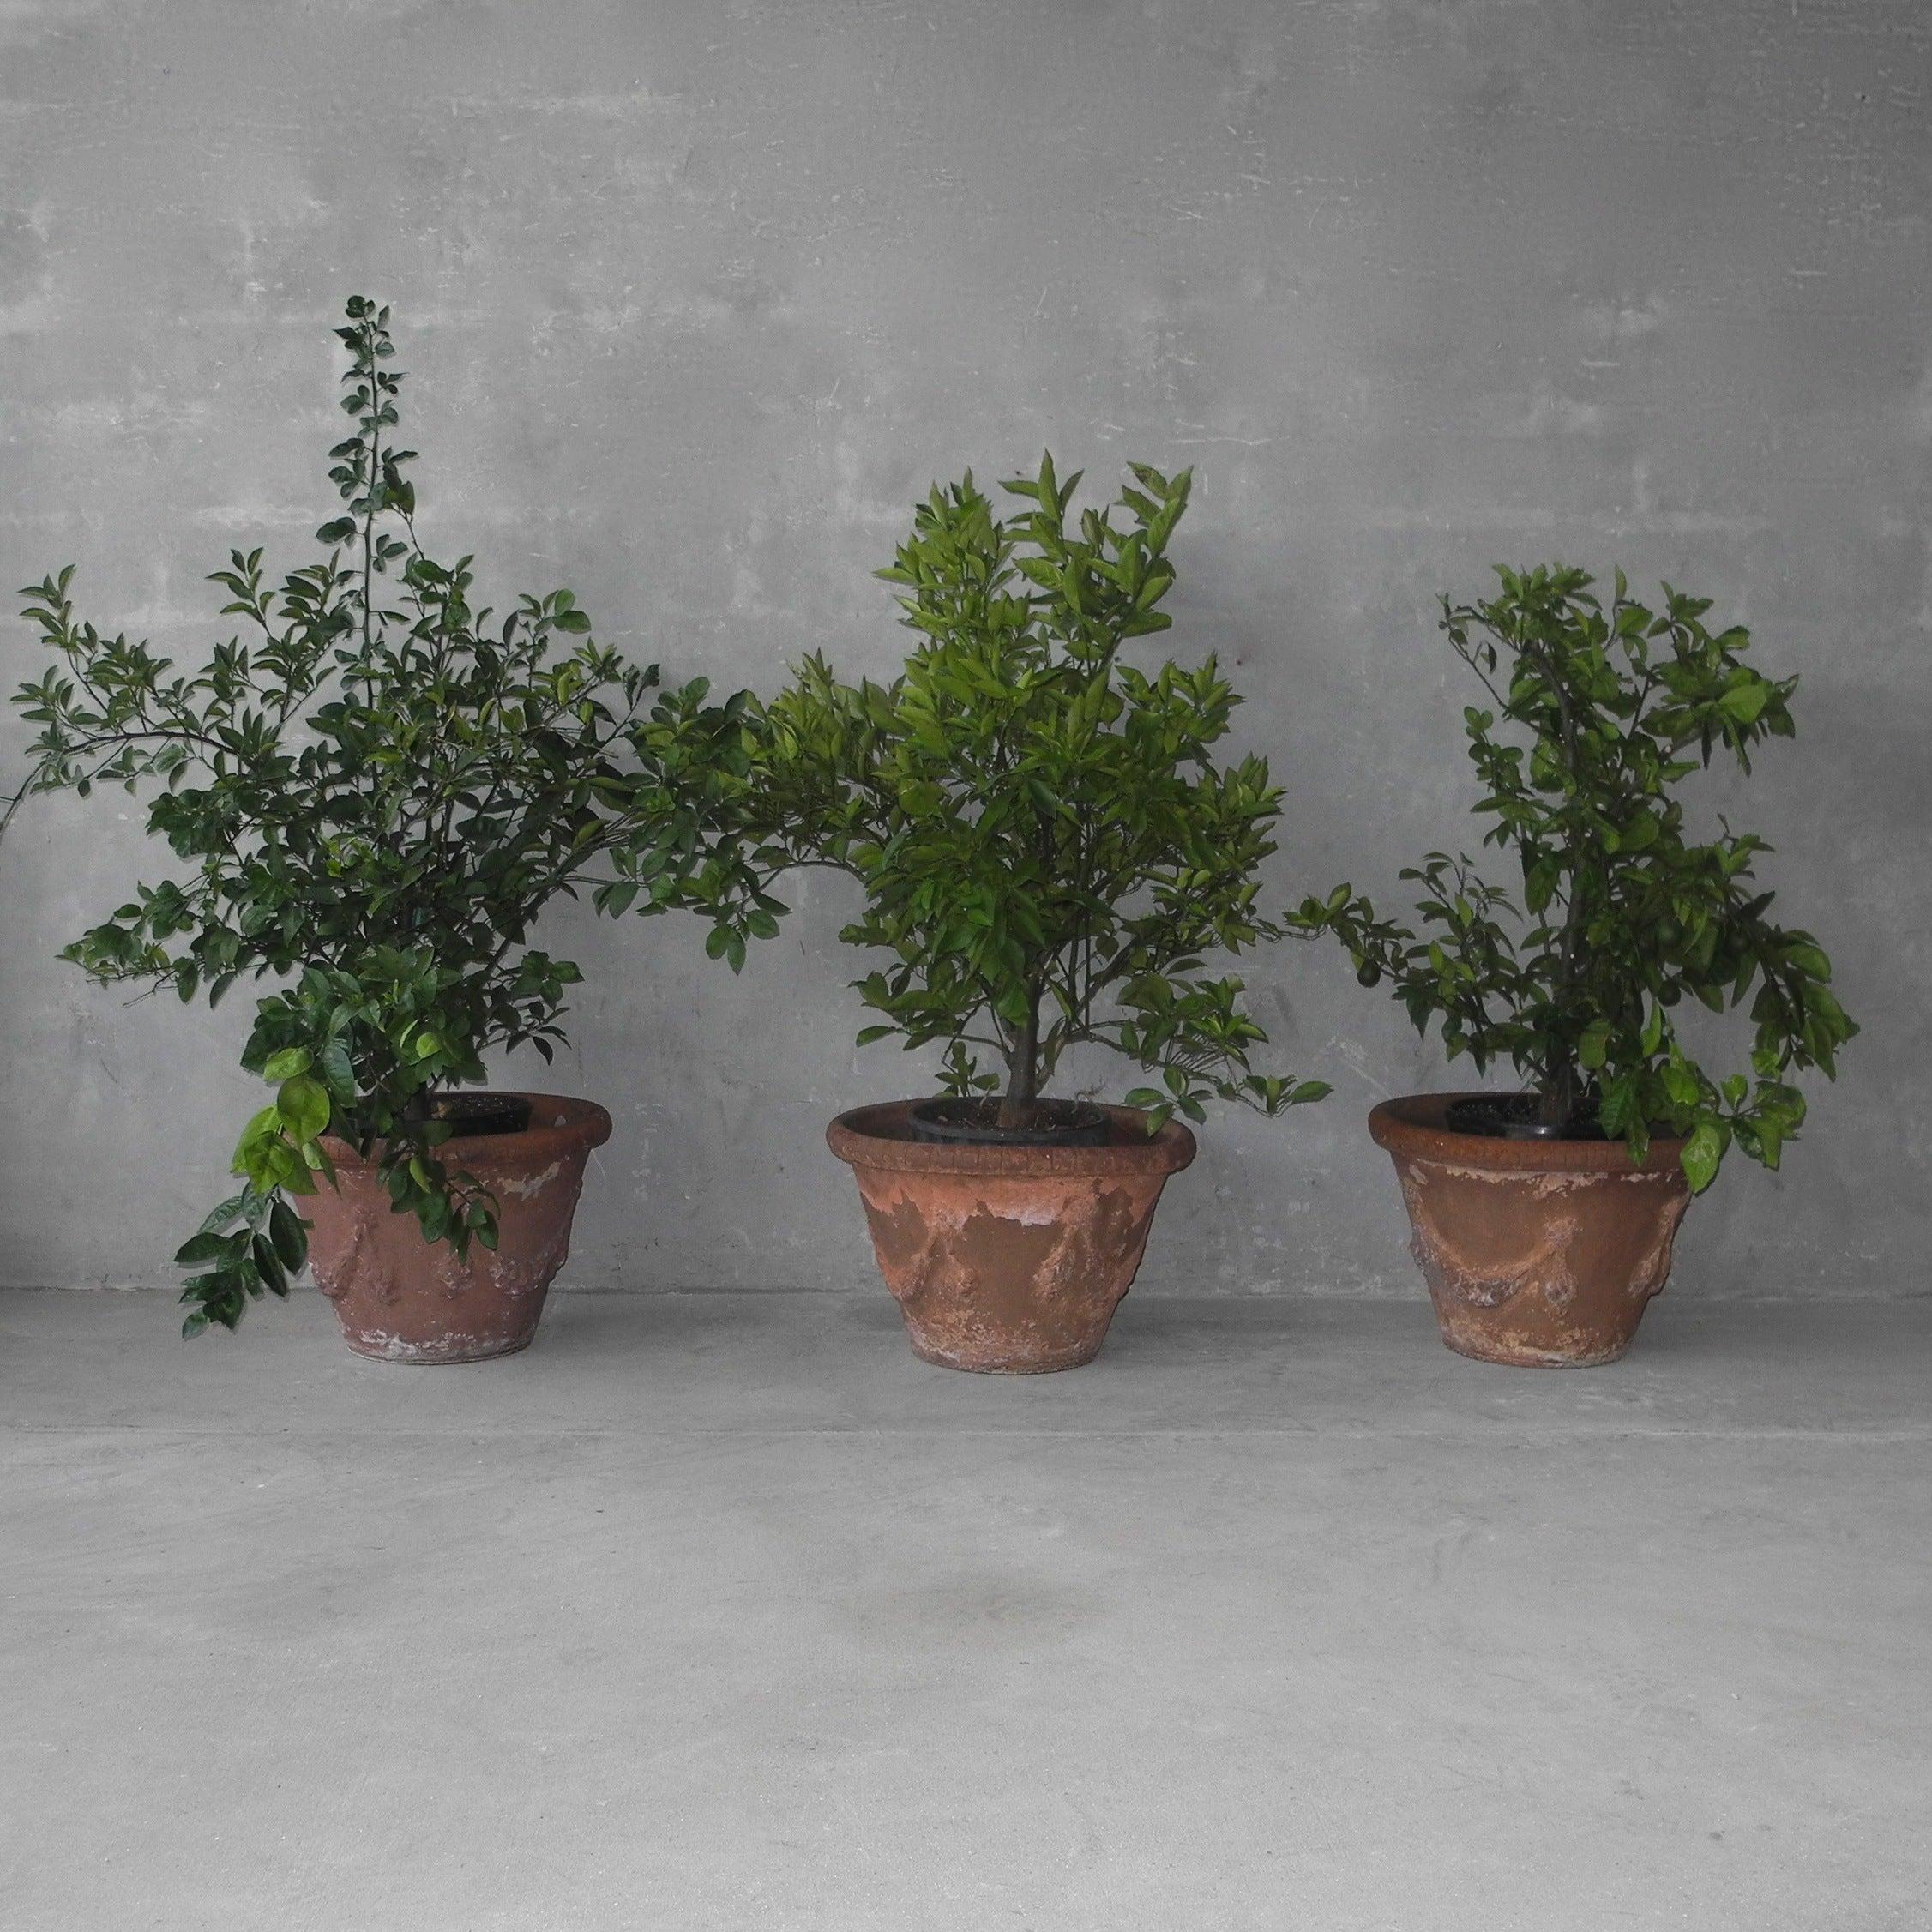 Set of 3 Italian Terracotta Planters